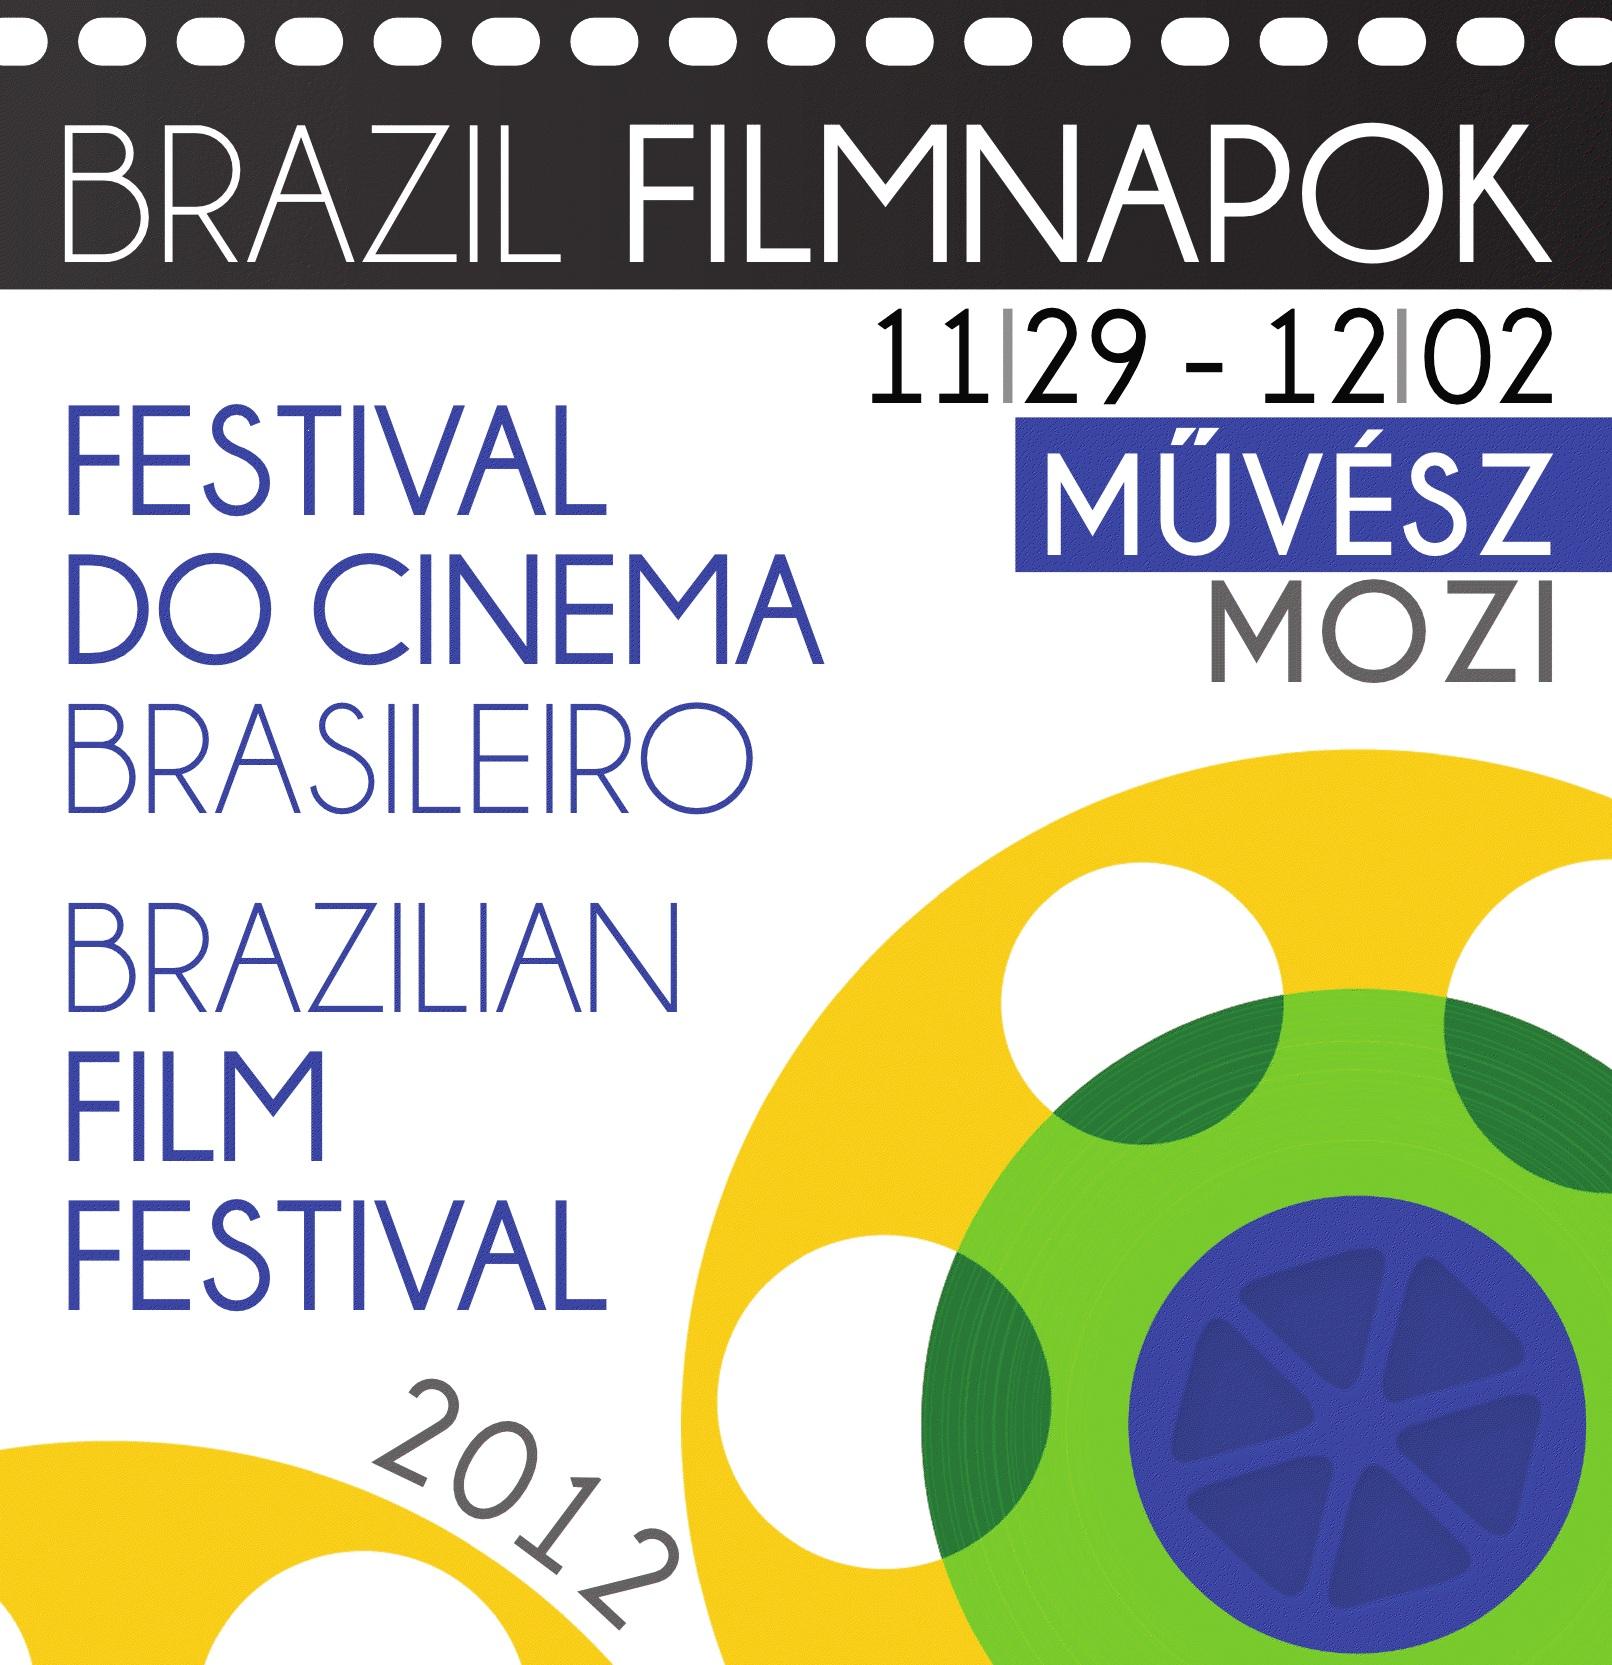 brazilfilmnapok